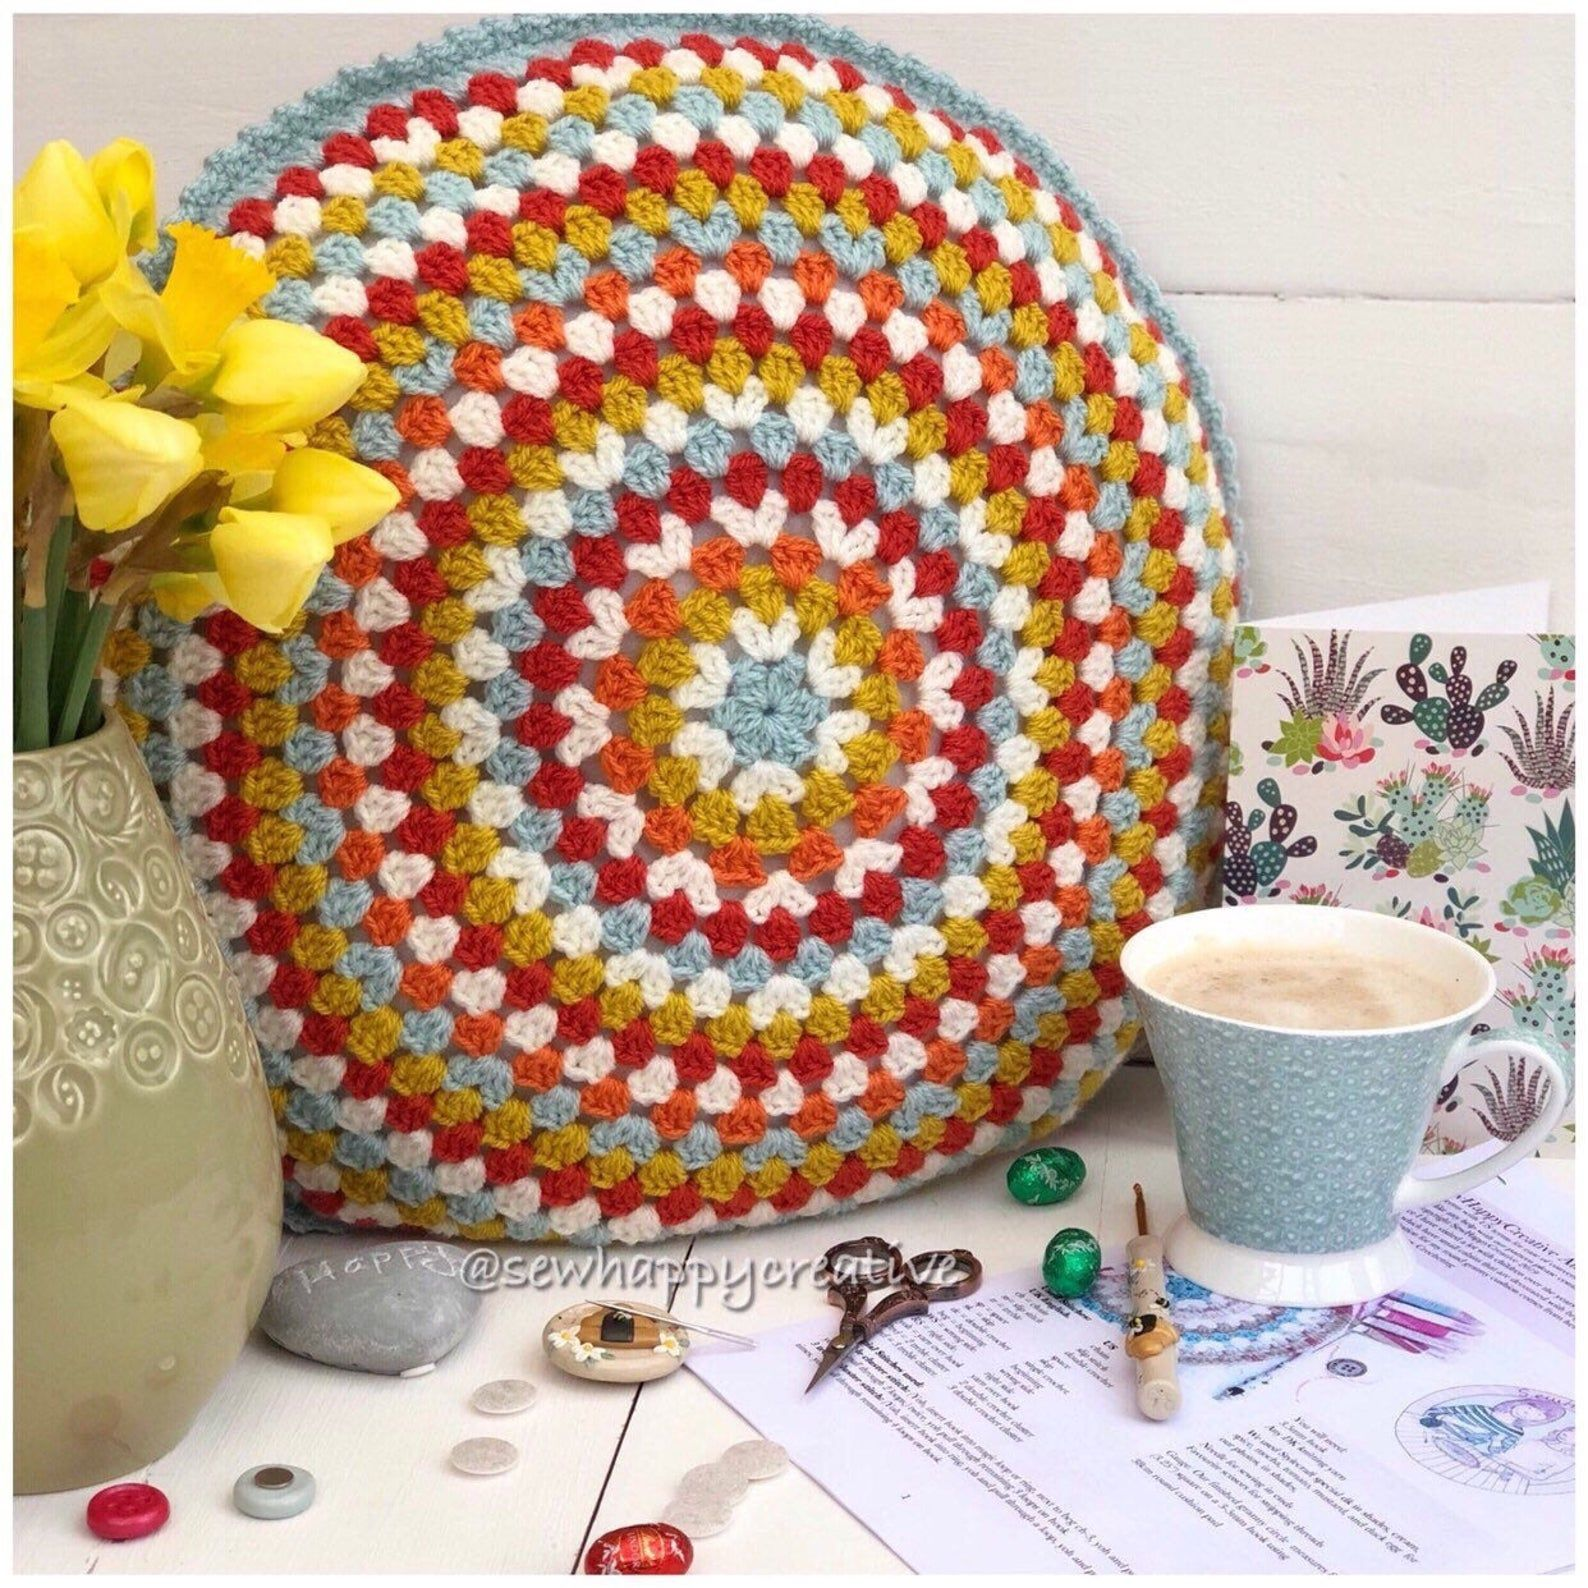 Crochet Pattern, Round Crochet Cushion, Crochet Pillow Pattern, Crochet Cushion pattern, PDF Pattern, PDF Crochet Tutorial Instant Download